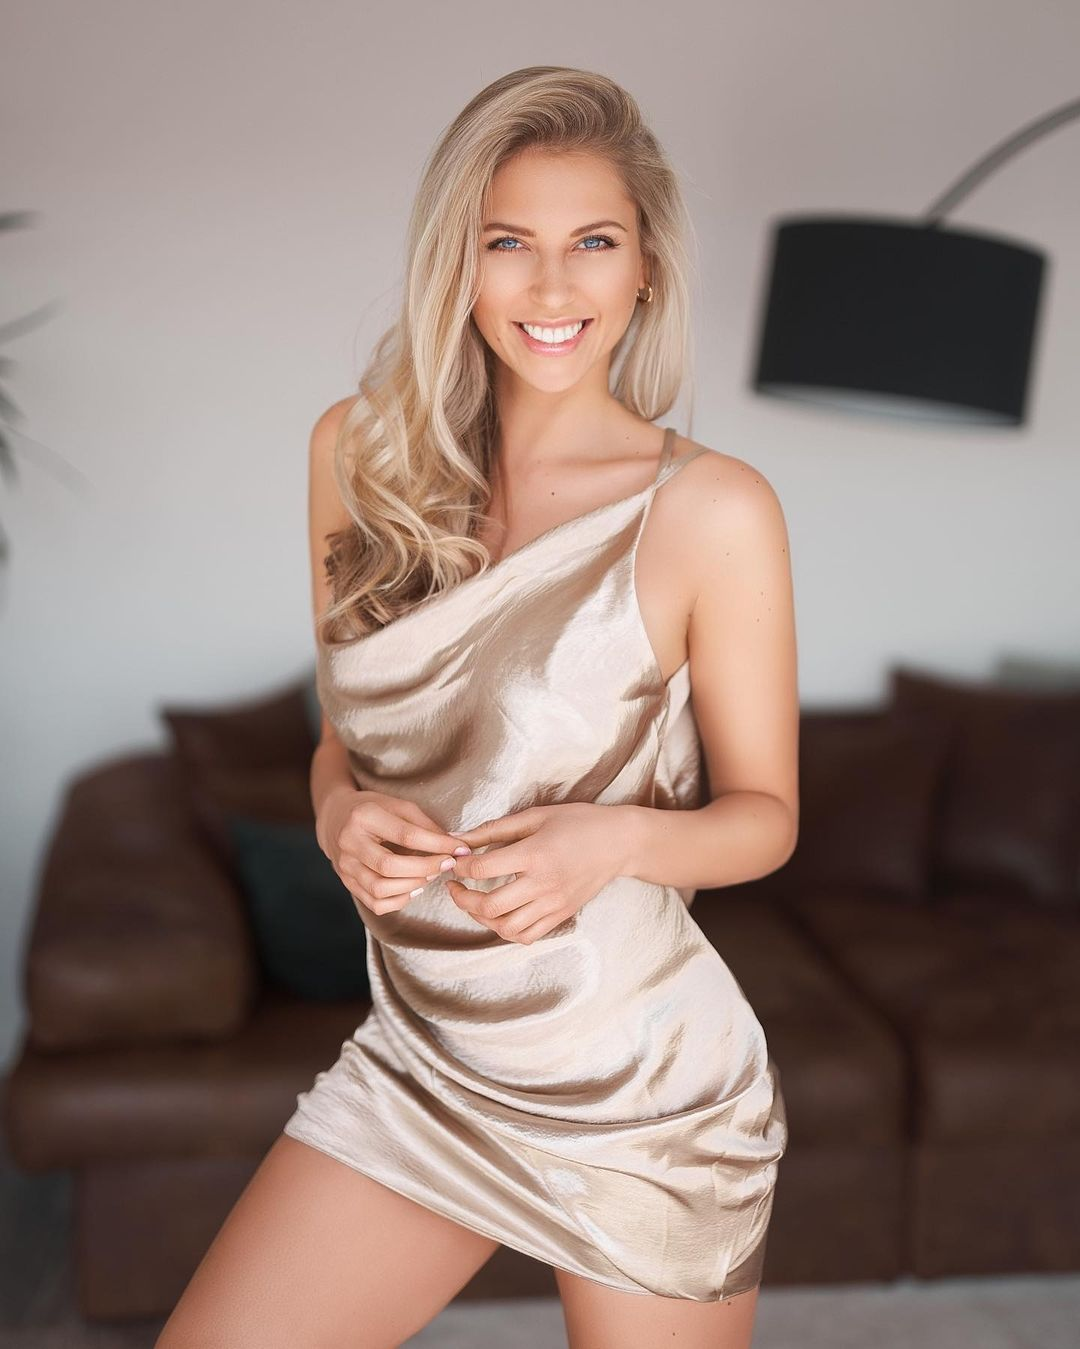 Lea-Manuela-Wallpapers-Insta-Fit-Bio-4